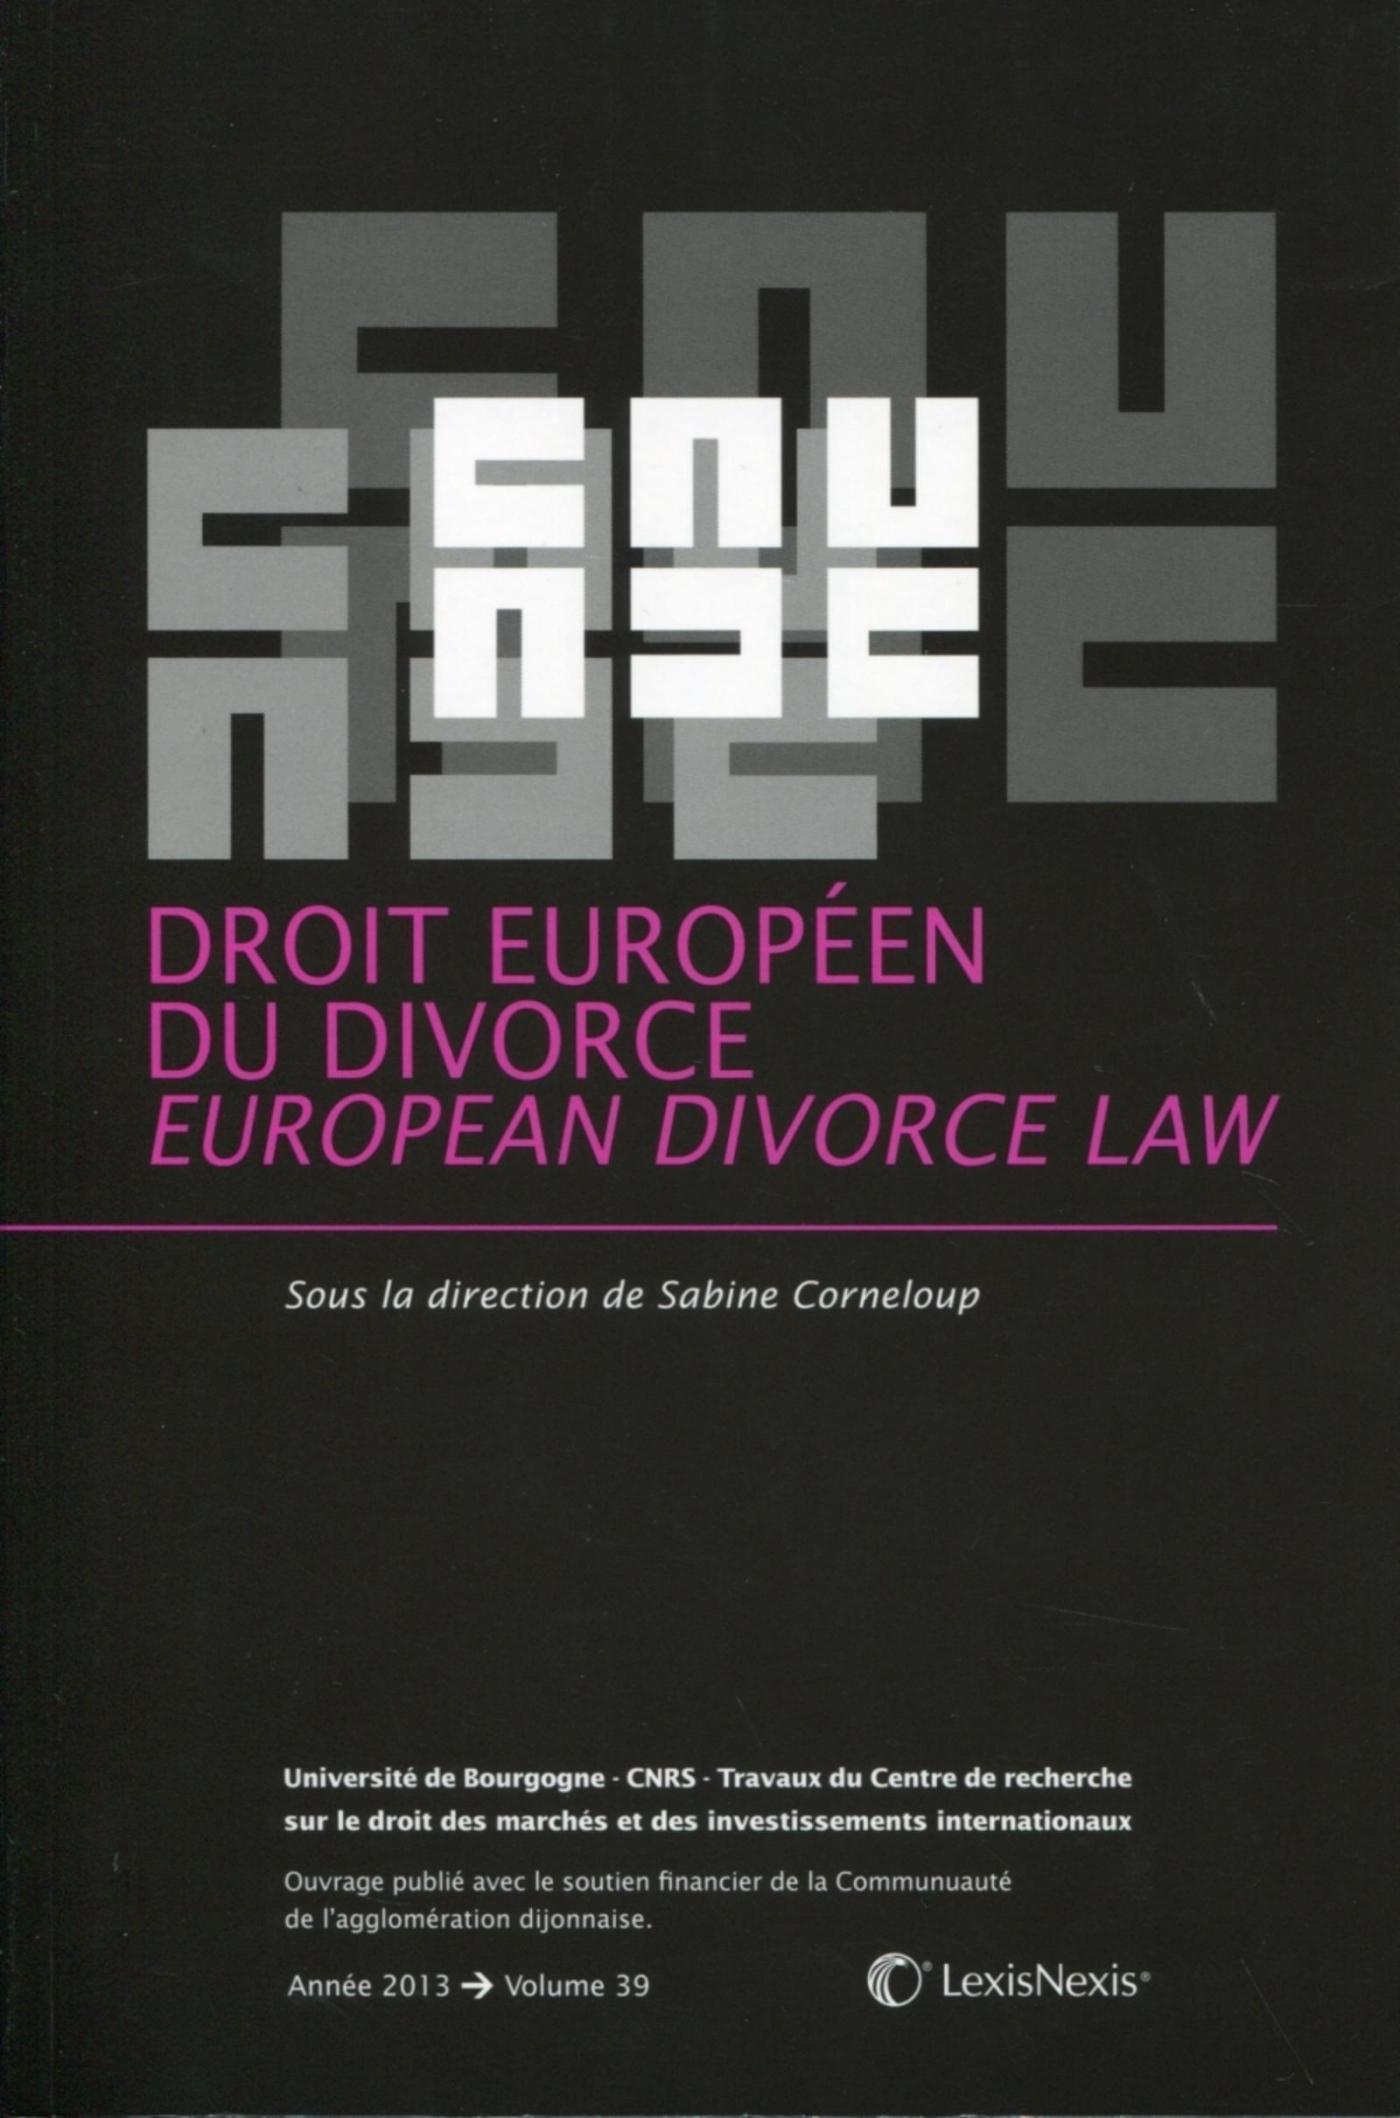 DROIT EUROPEEN DU DIVORCE - EUROPEAN DIVORCE LAW.